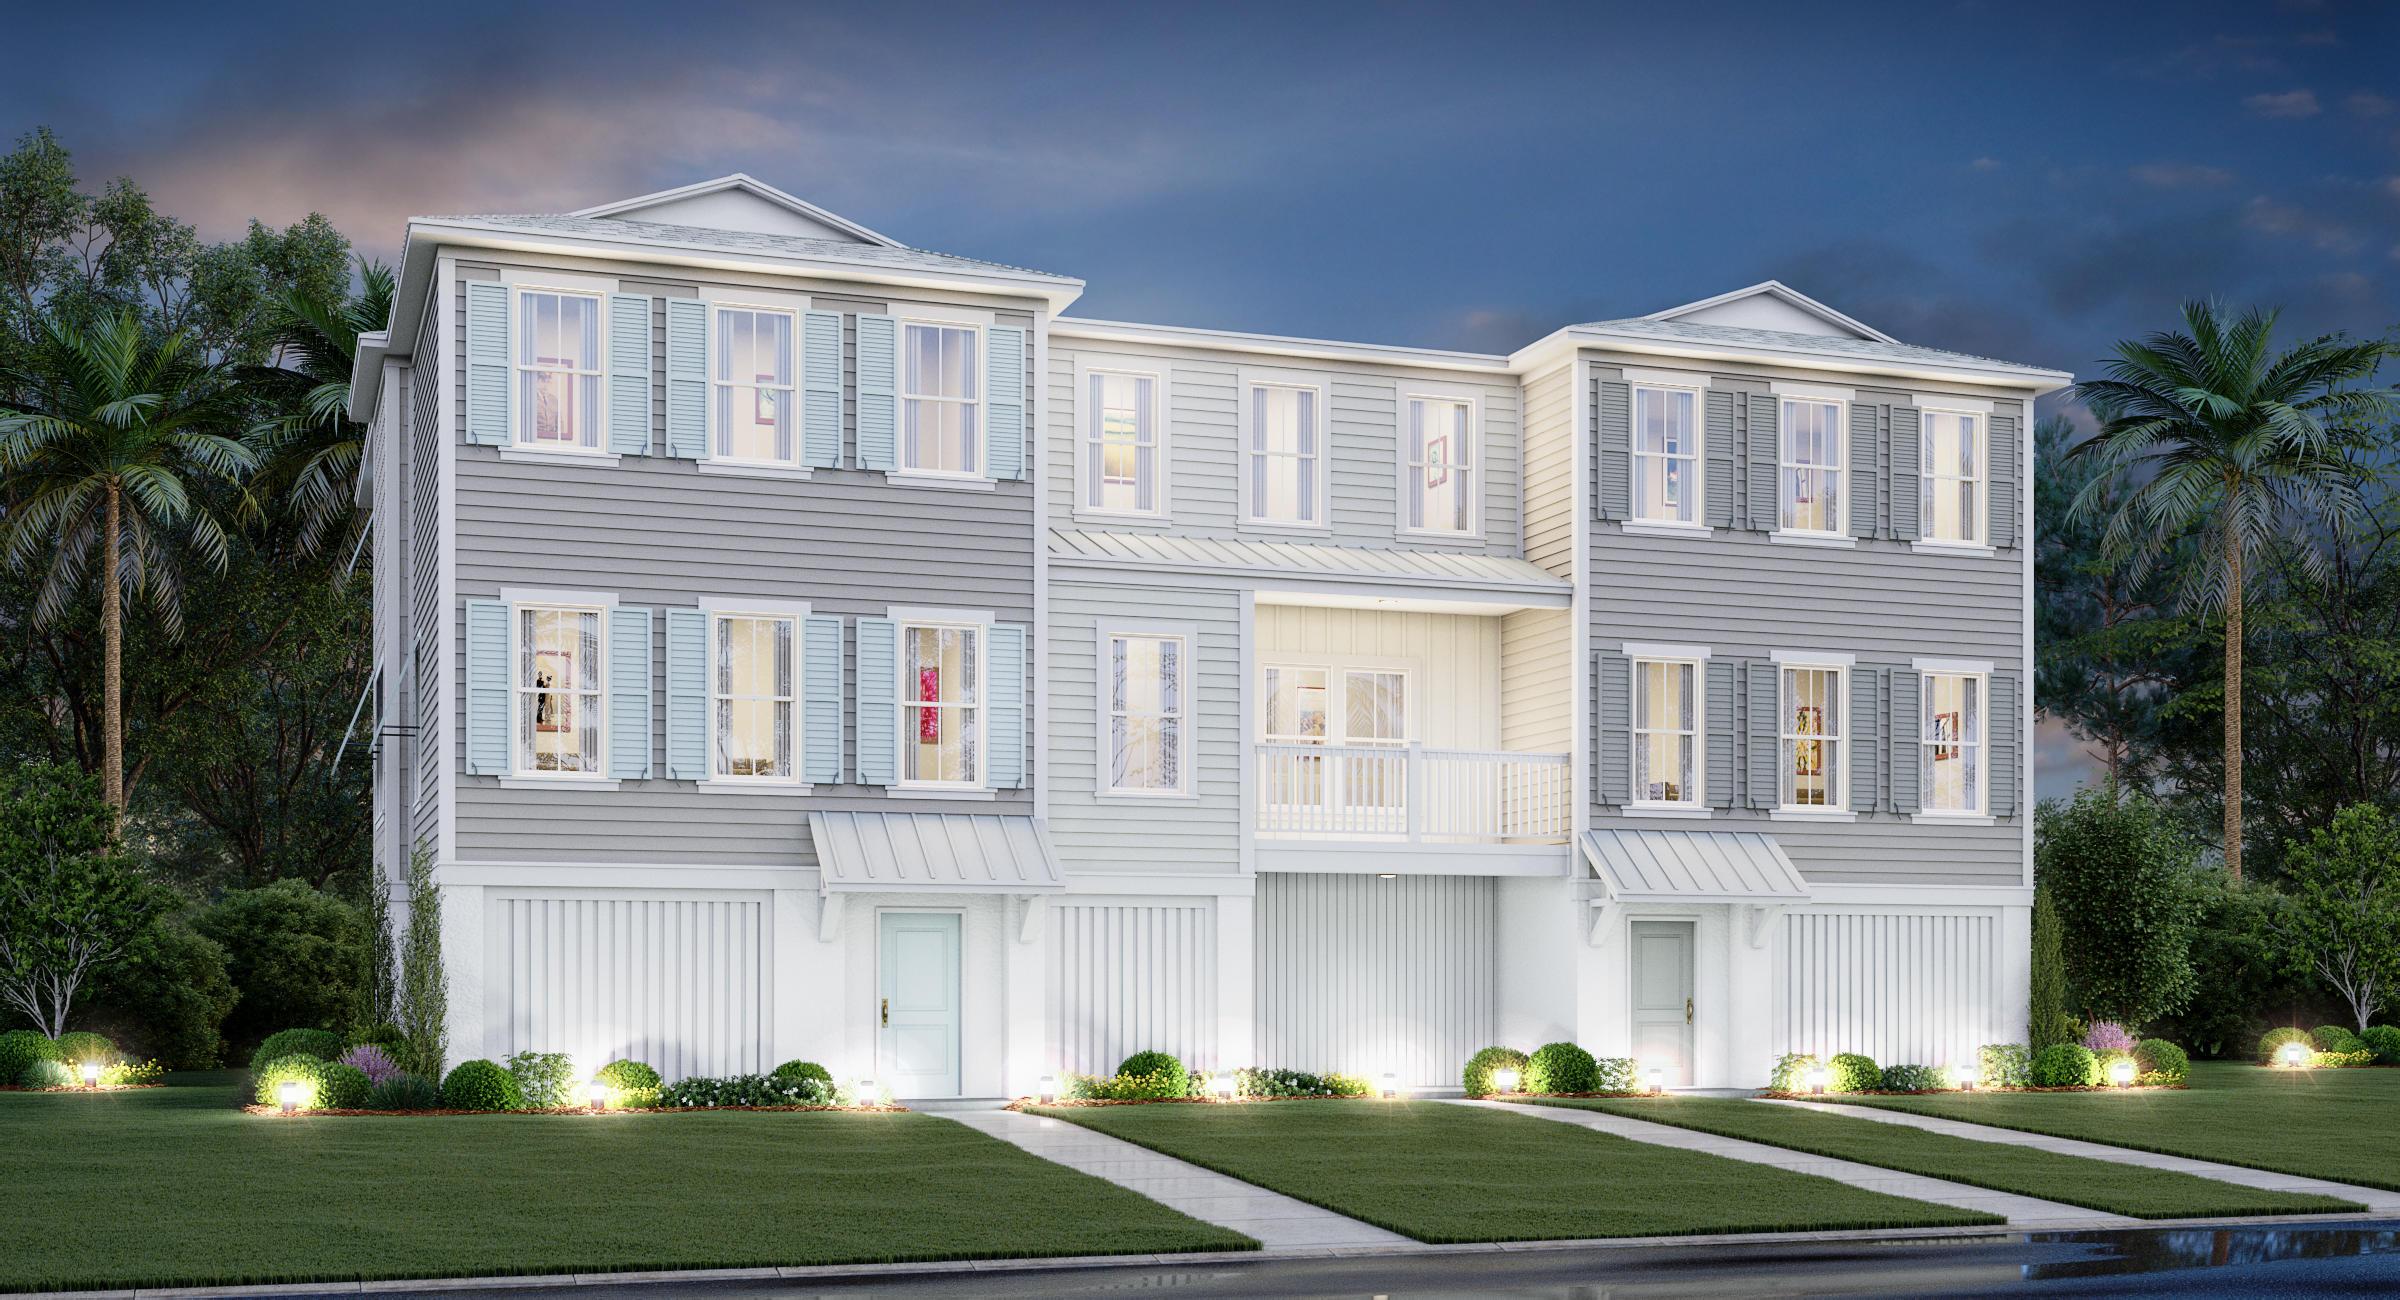 Kings Flats Homes For Sale - 103 Crozet, Charleston, SC - 2